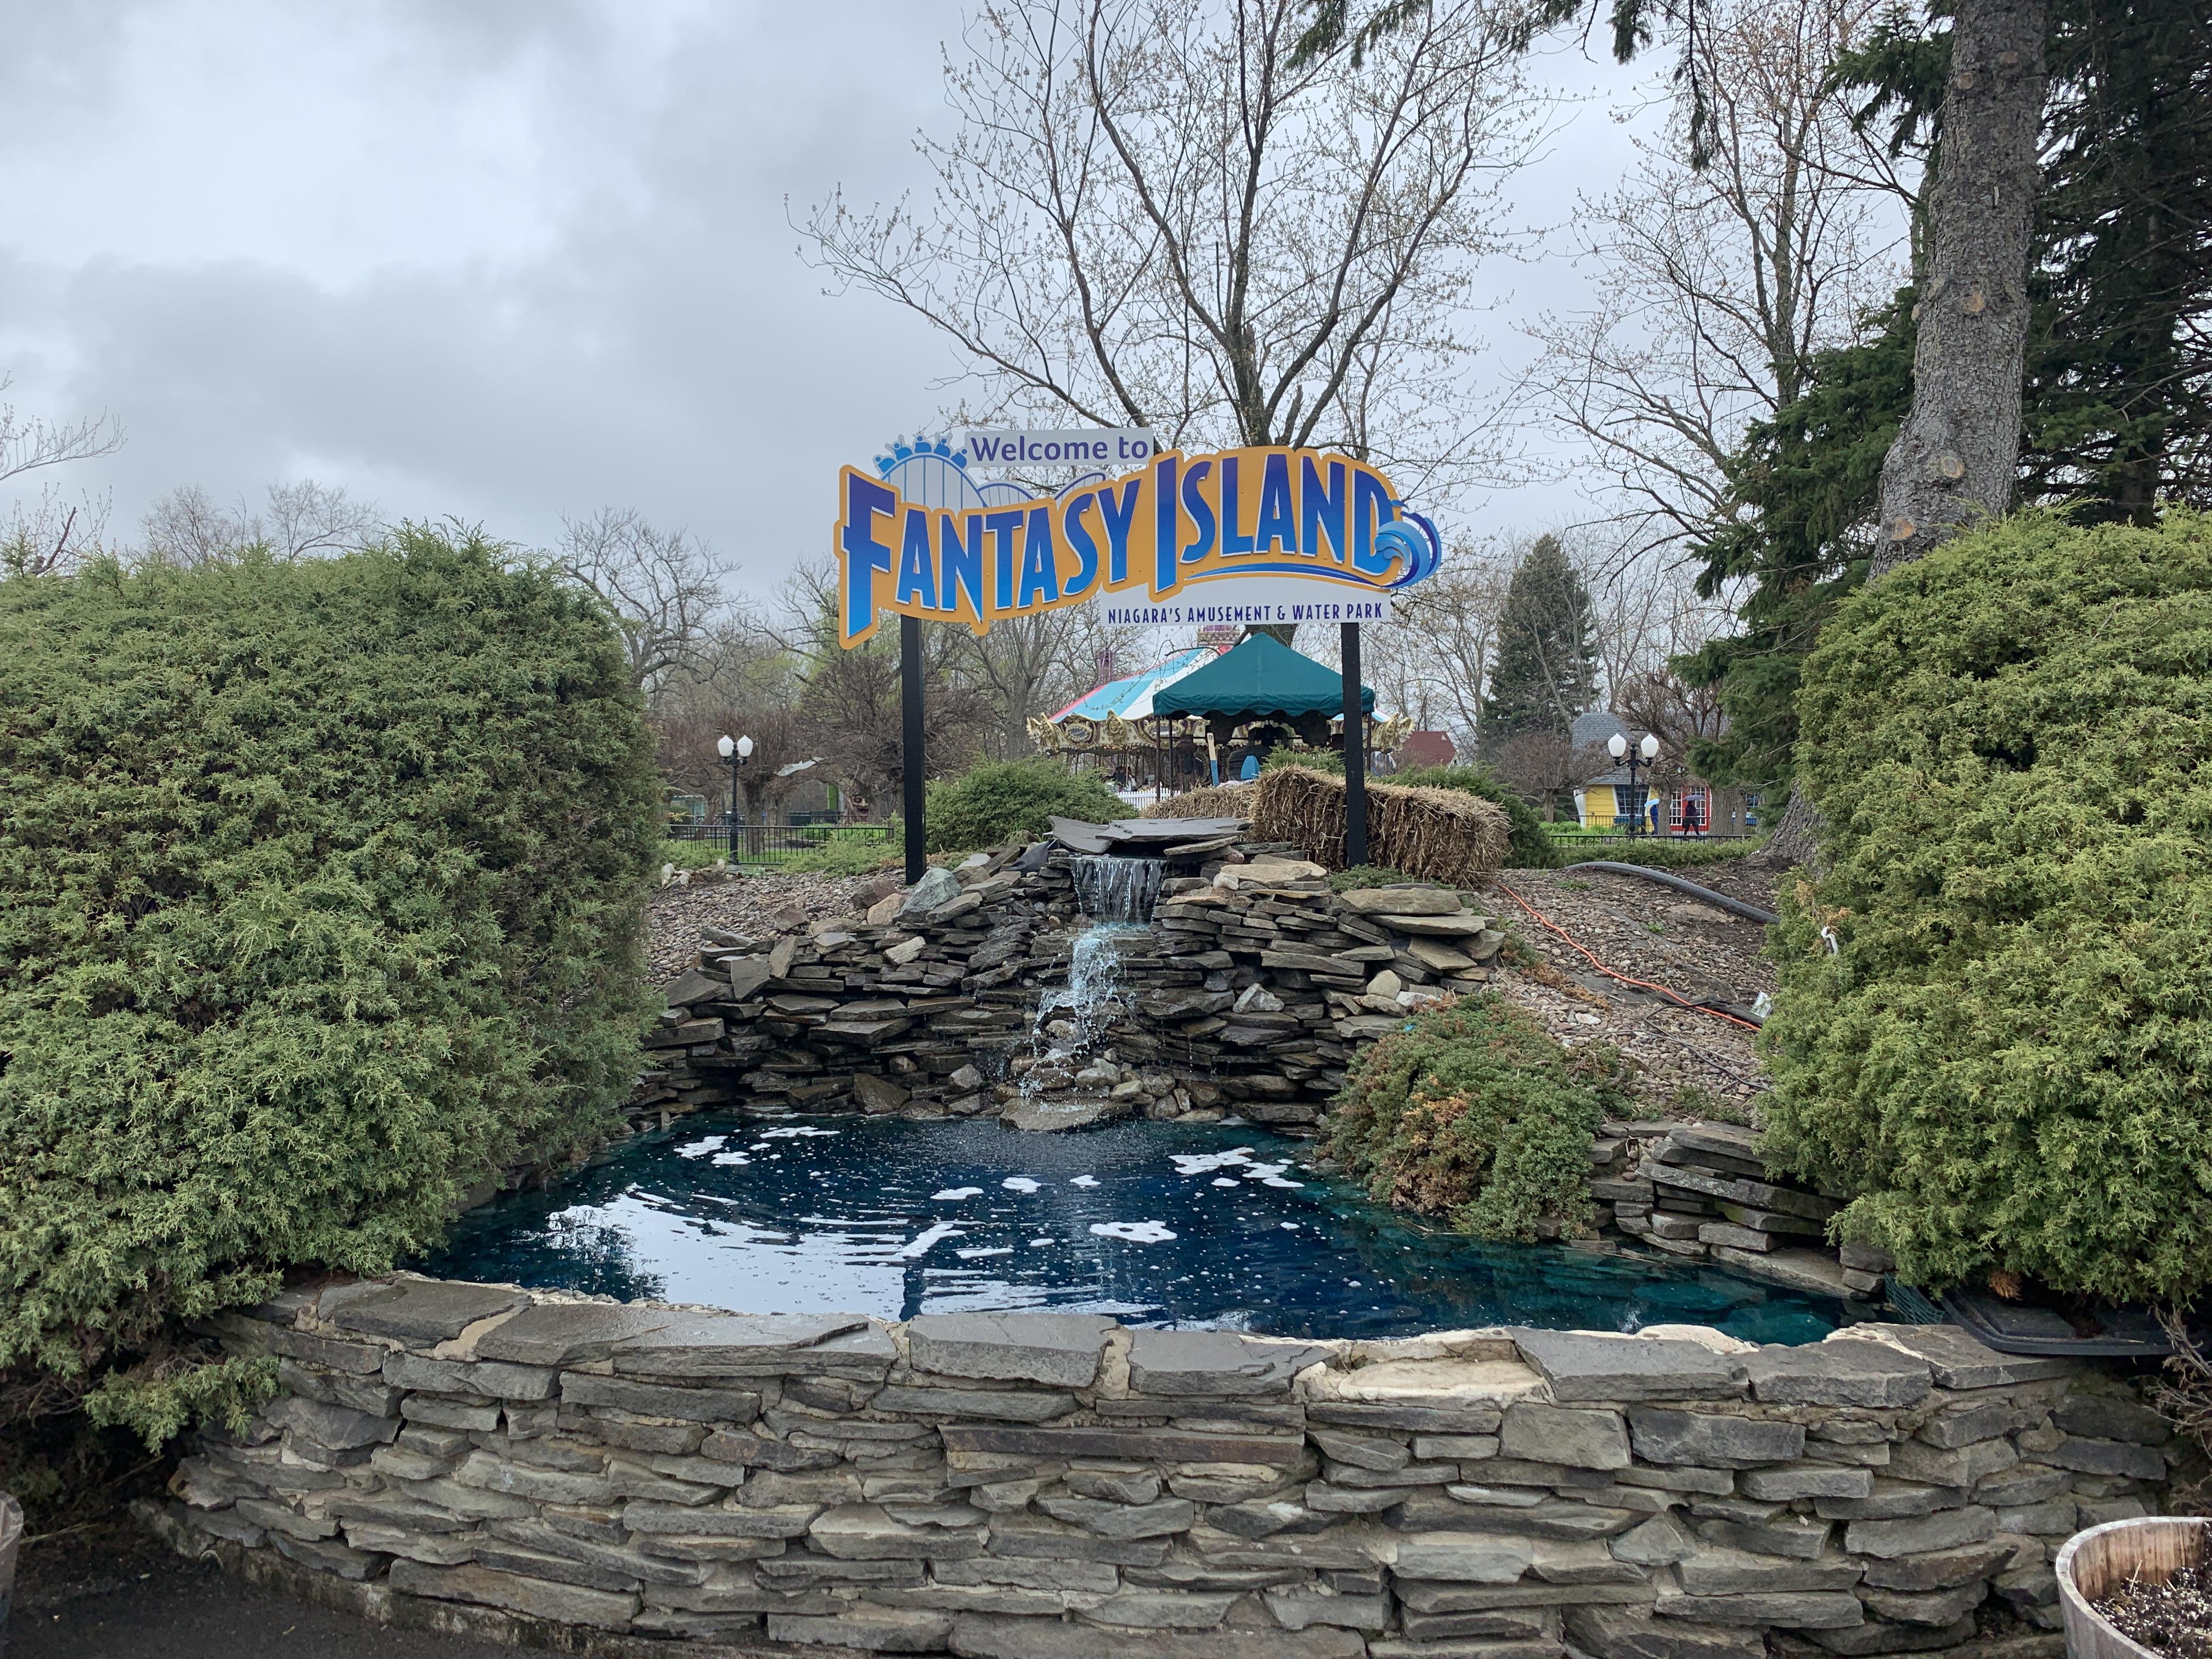 Martin's Fantasy Island 2019